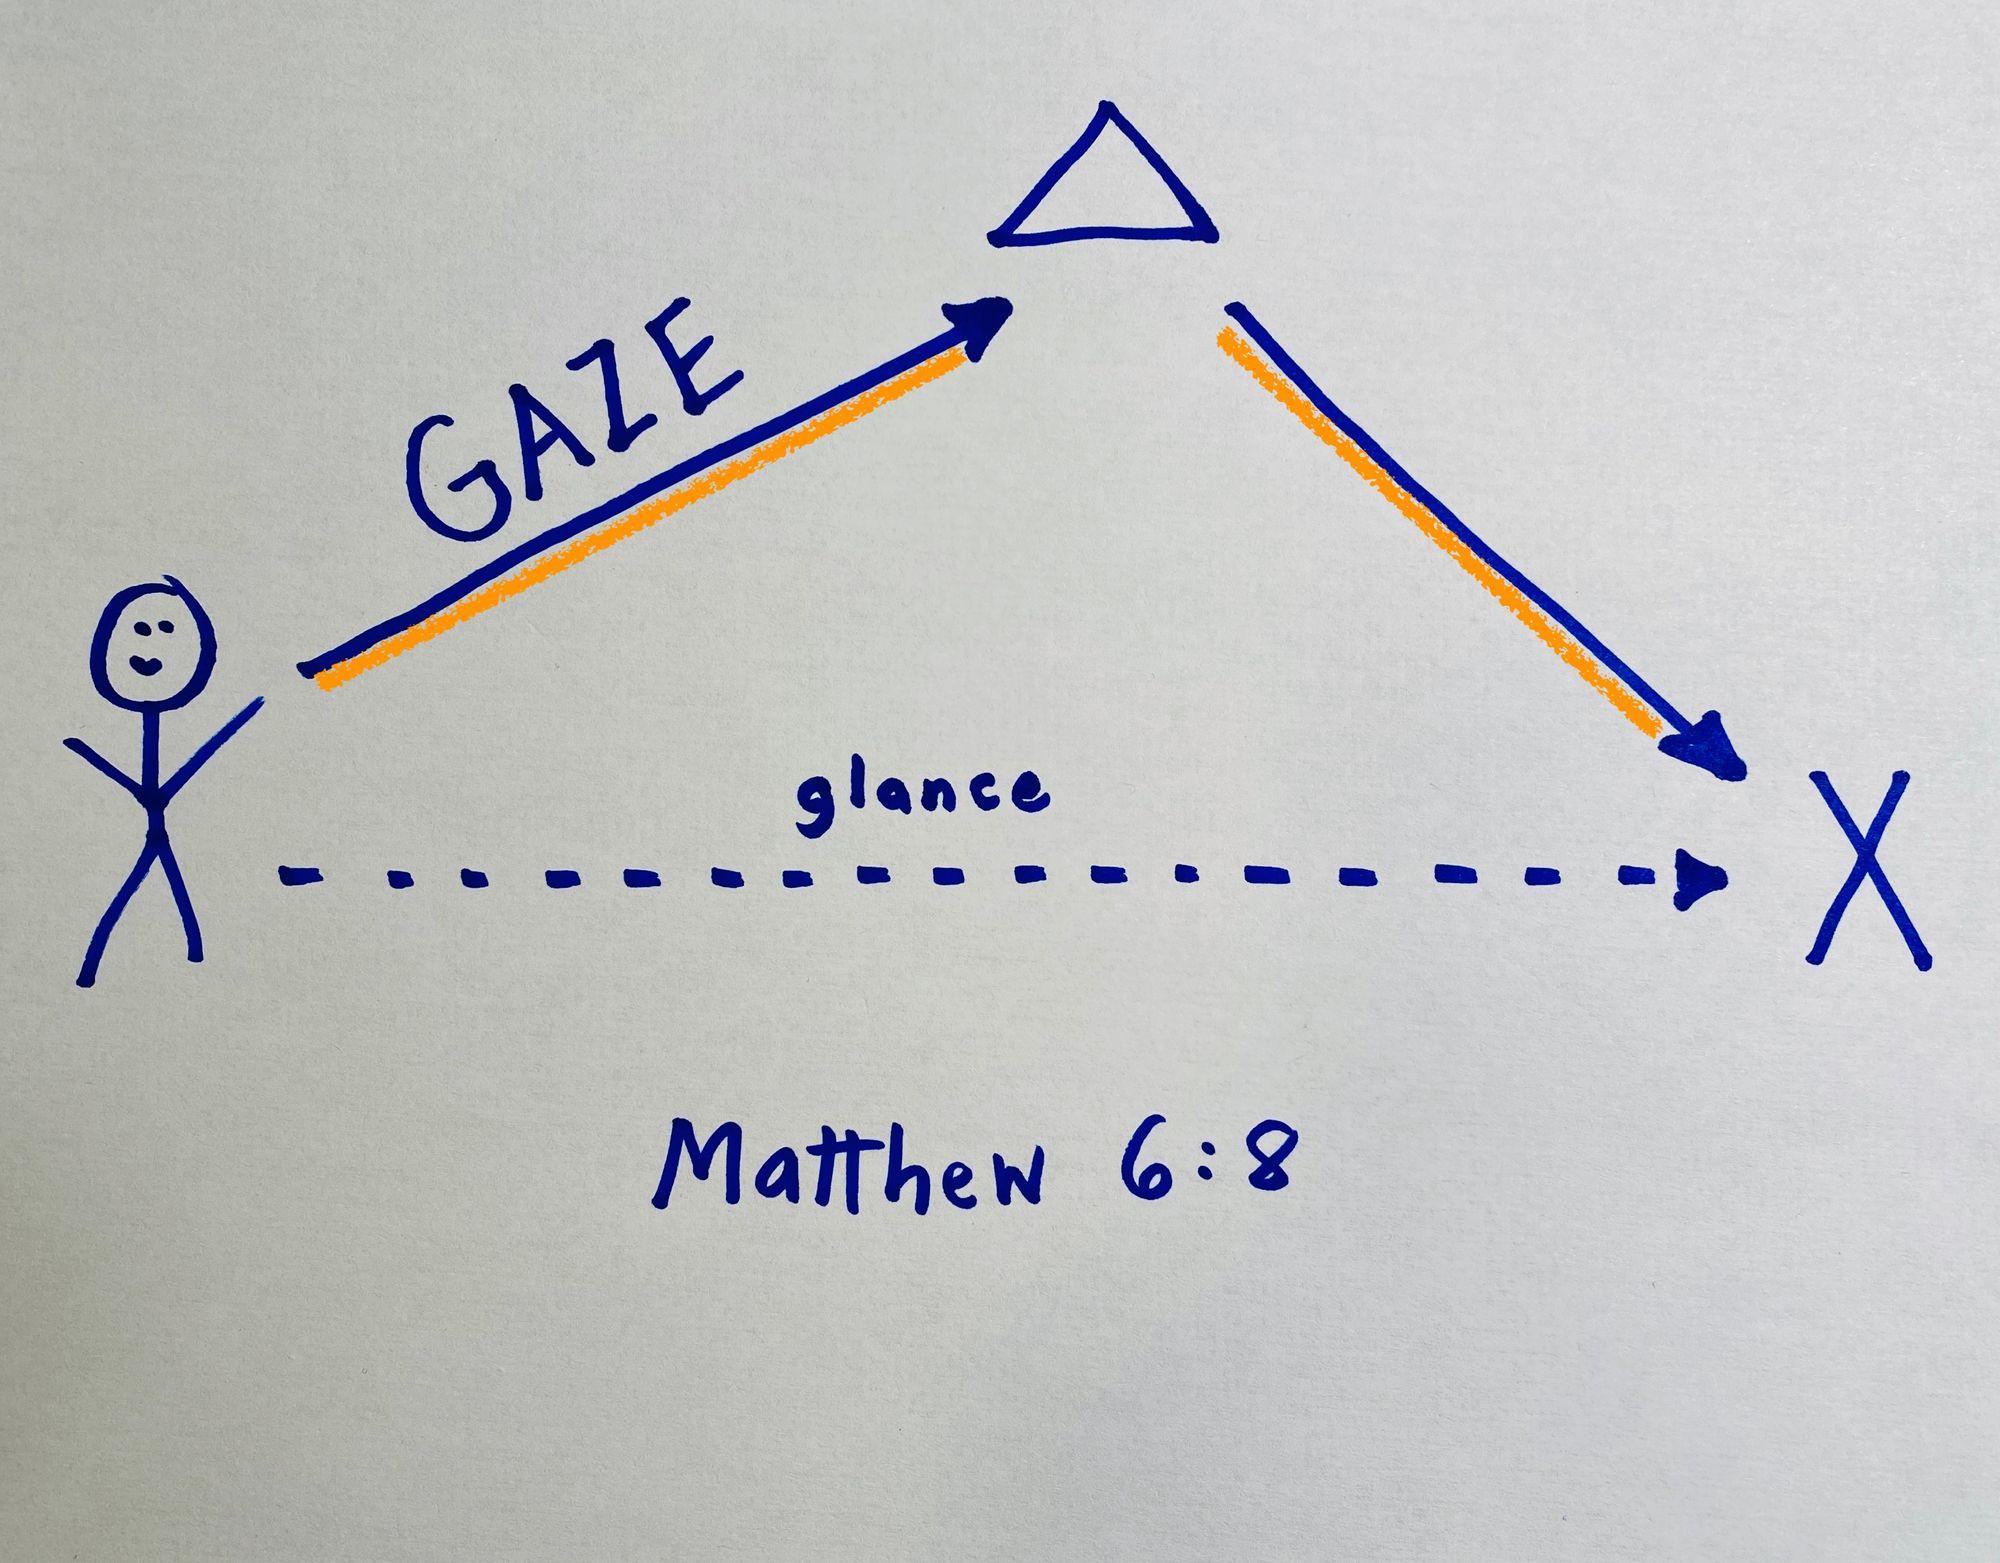 Gaze at God, Glance at Request